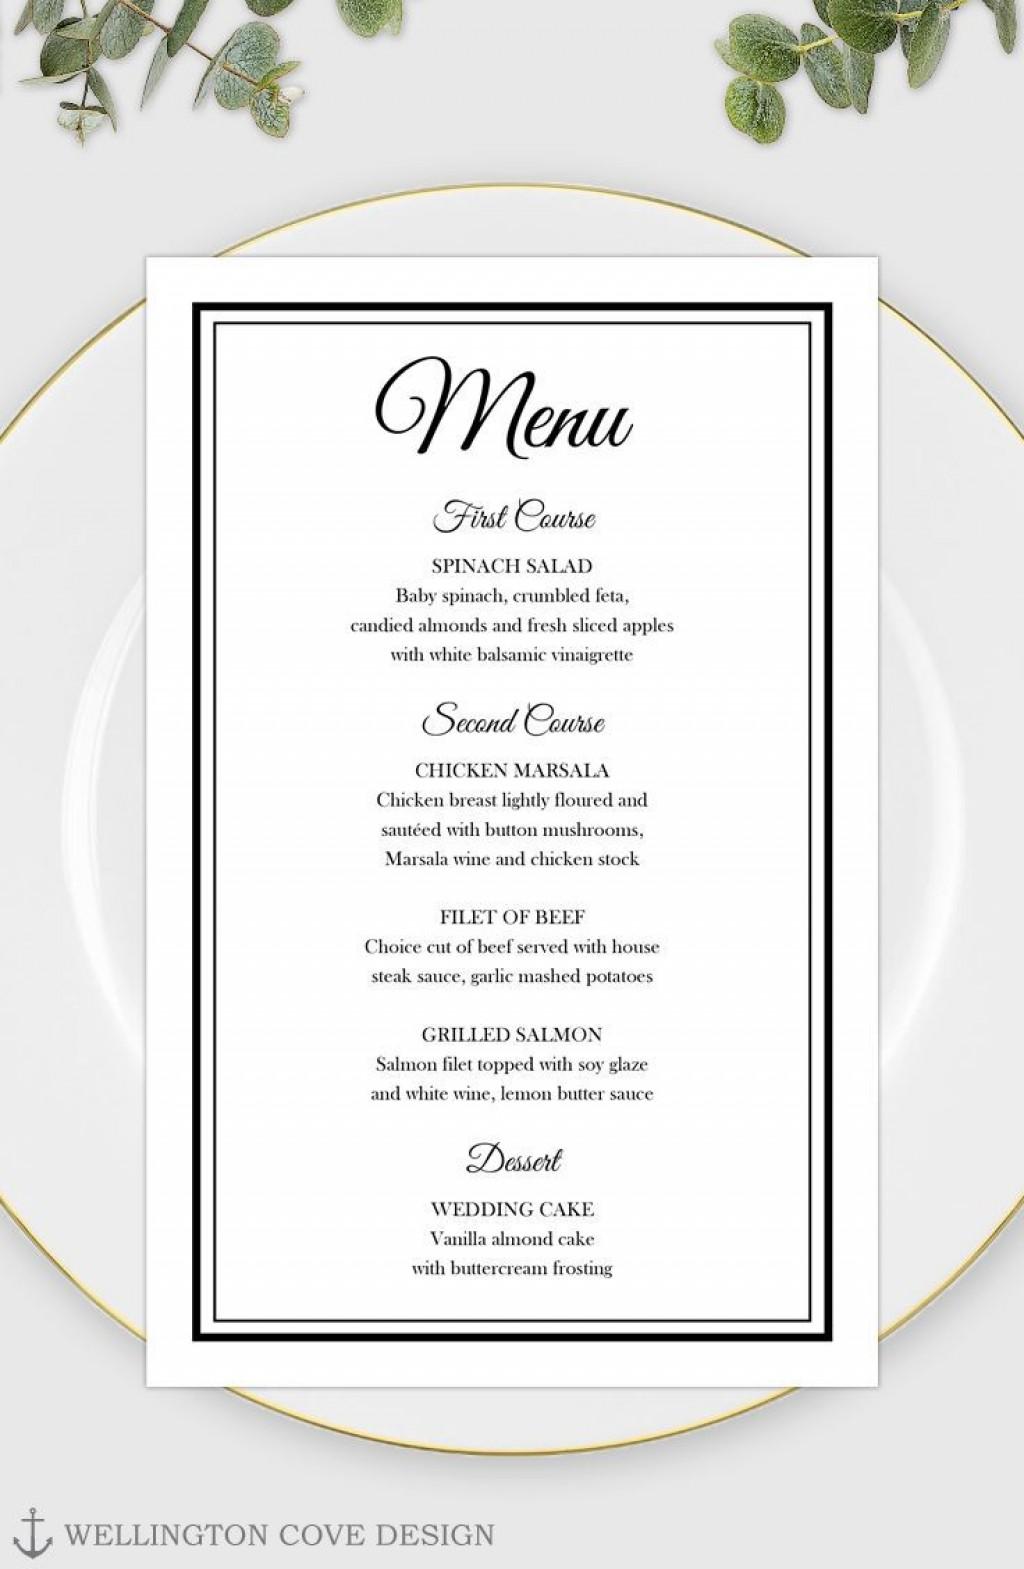 002 Unbelievable Free Wedding Menu Template To Print Example  Printable CardLarge